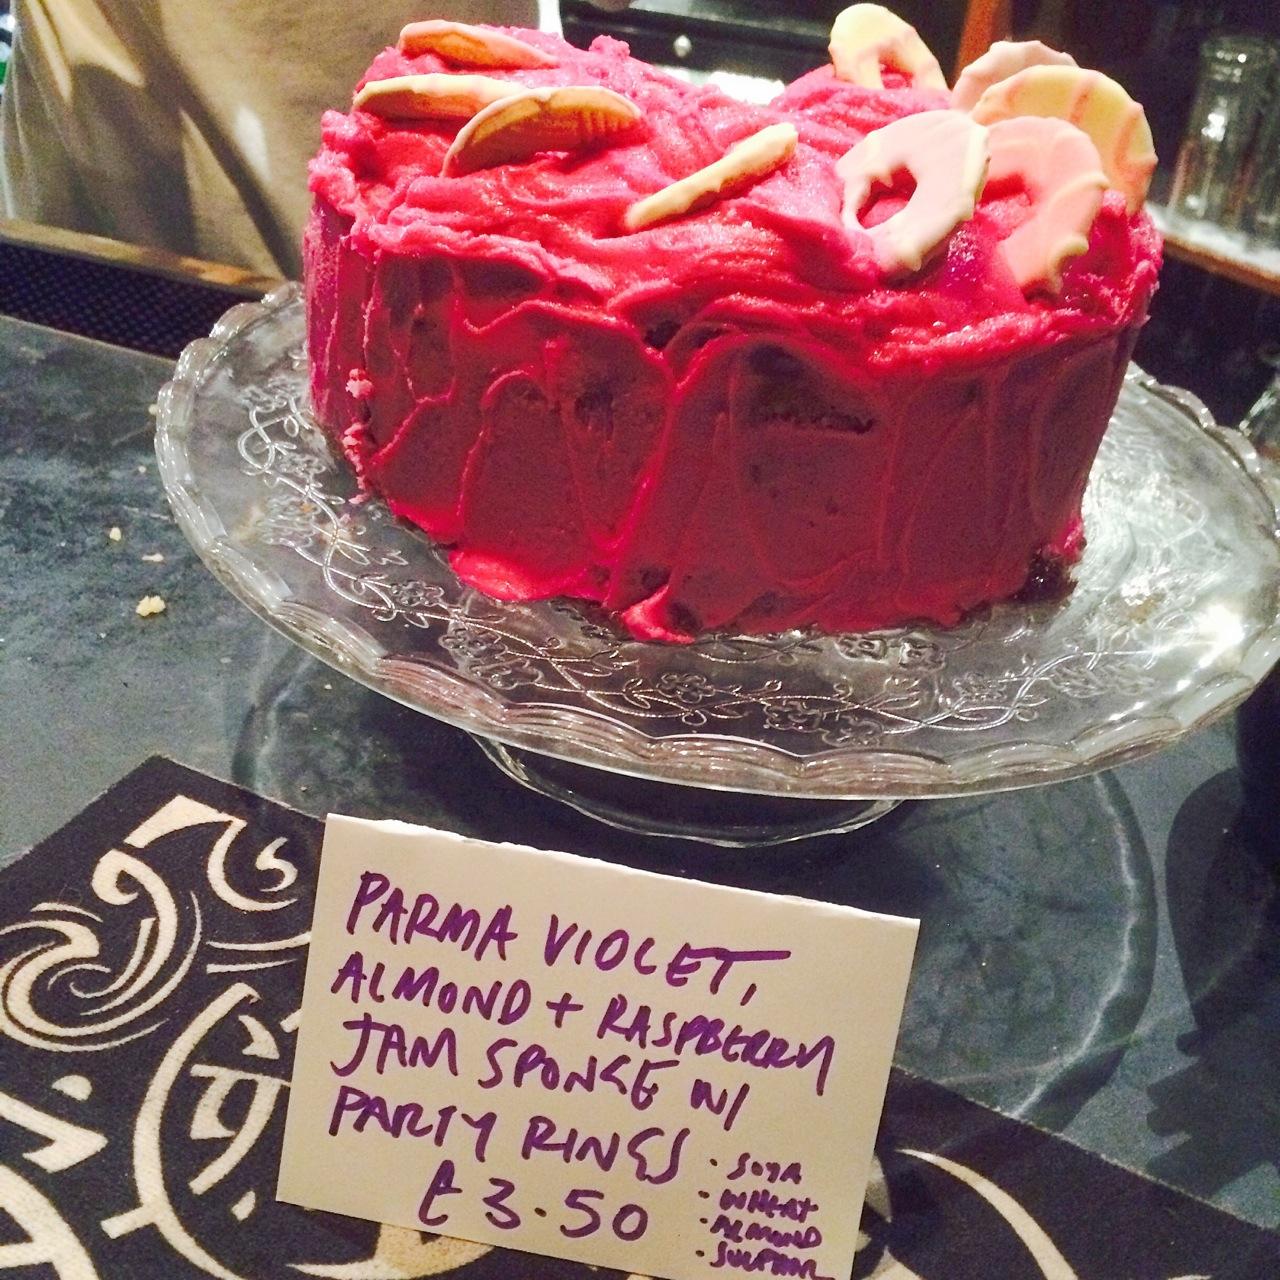 http://i1.wp.com/fatgayvegan.com/wp-content/uploads/2015/12/Parma-violet-cake-vegan.jpg?fit=1280%2C1280